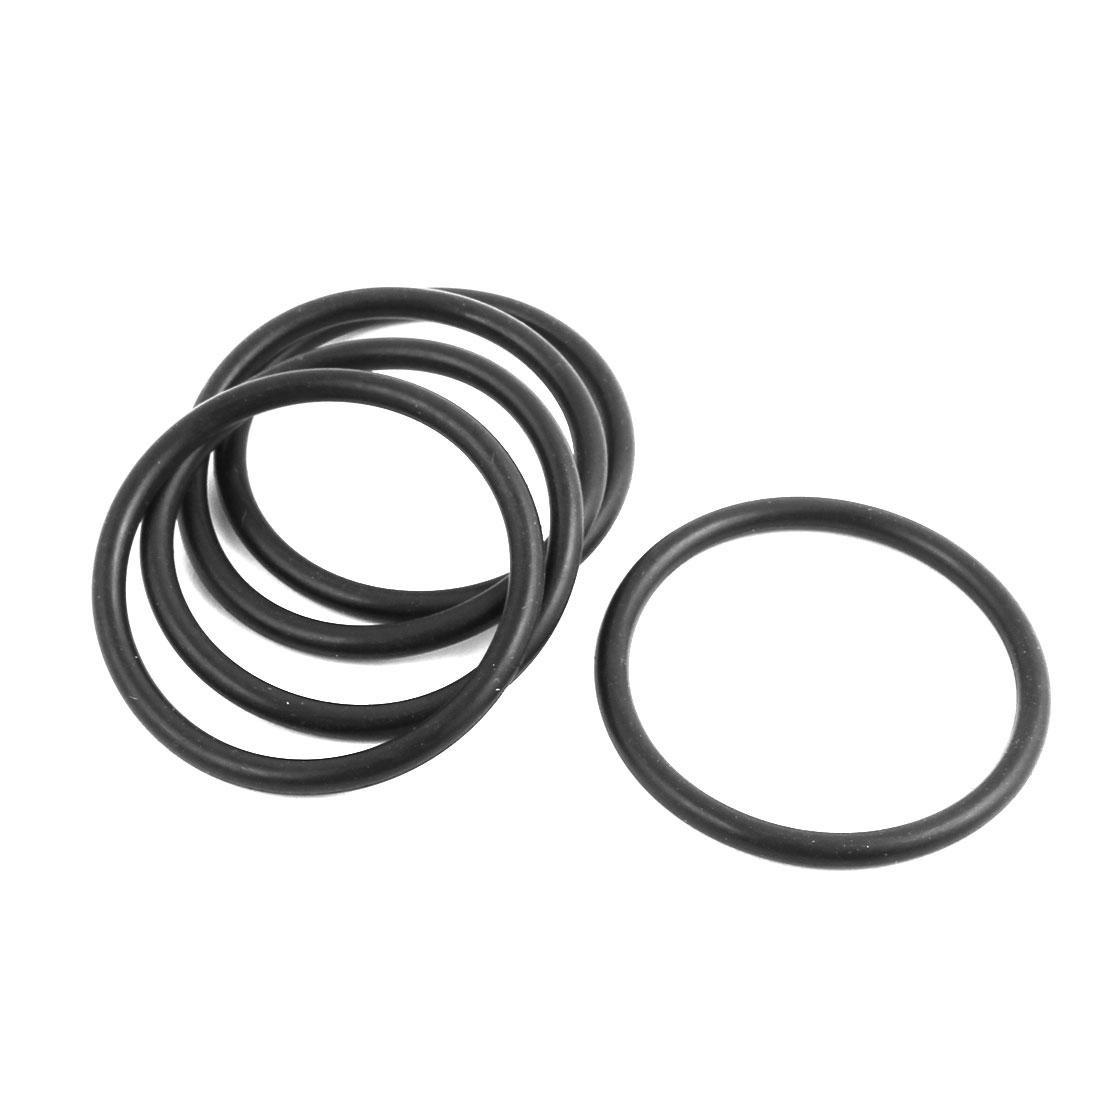 10 Pcs Metal 14mm Inner Diameter Shaft External Circlip